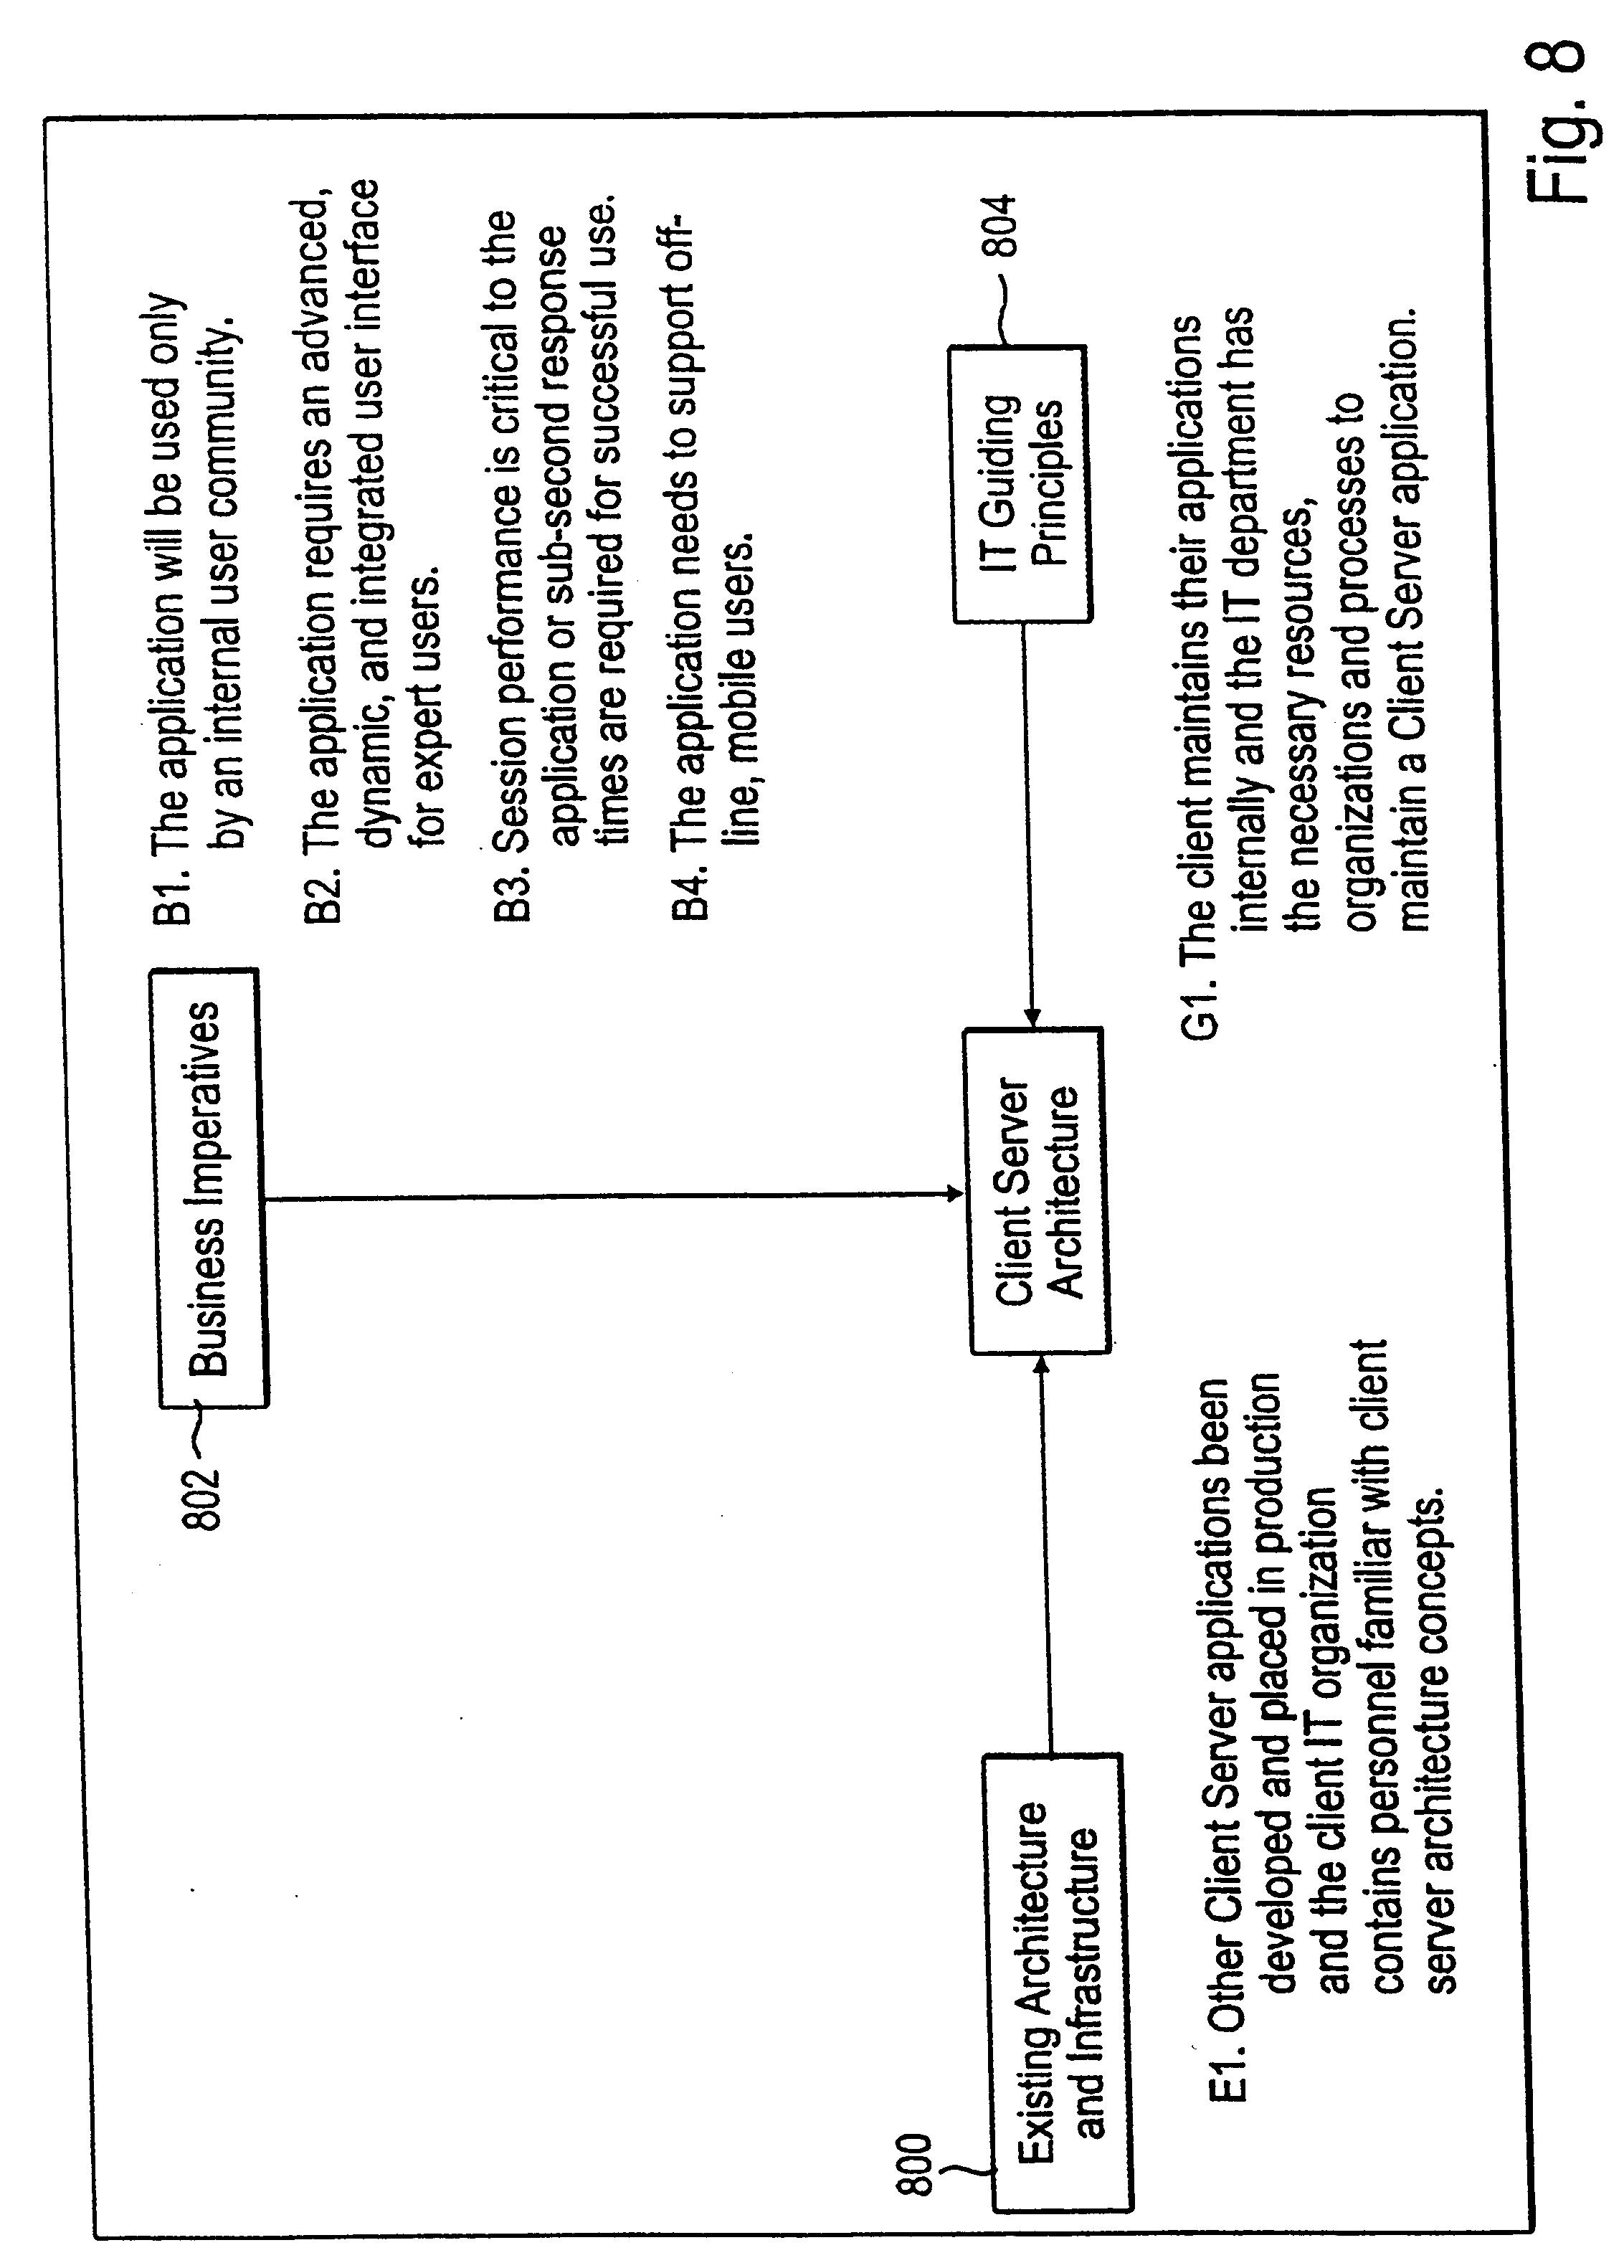 Patent US 6,606,660 B1